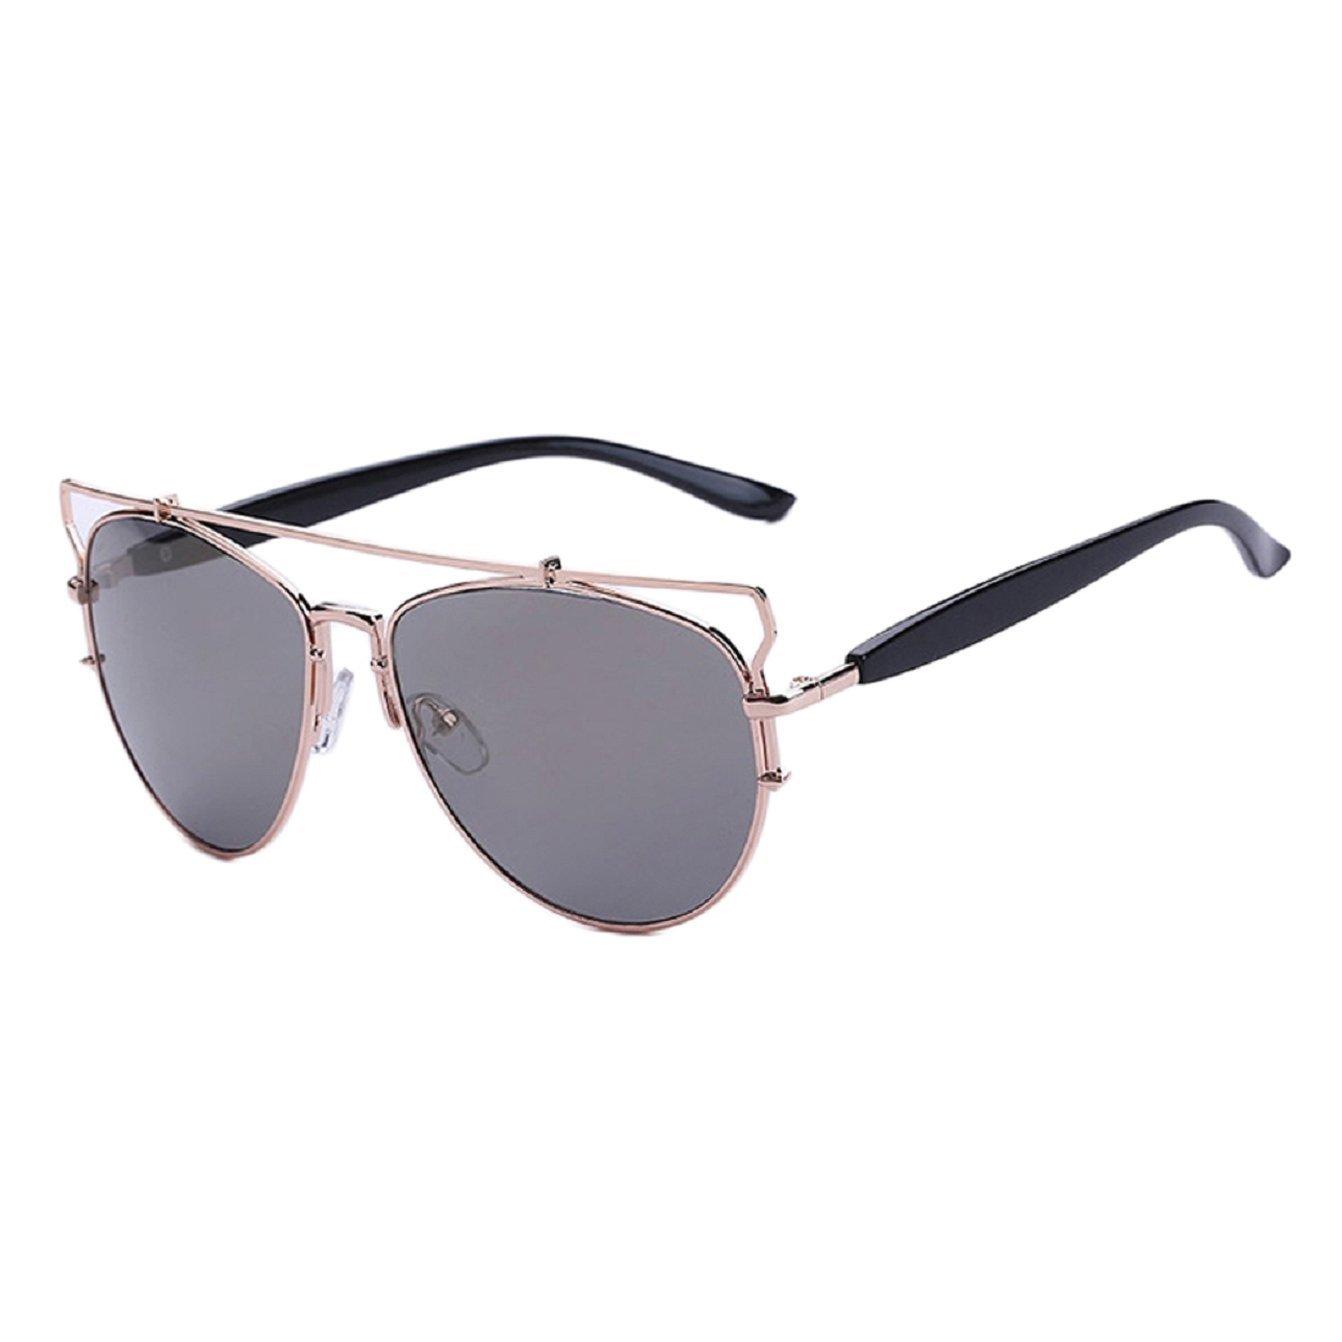 Cheap Retro Cat Eye Sunglasses, find Retro Cat Eye Sunglasses deals ...